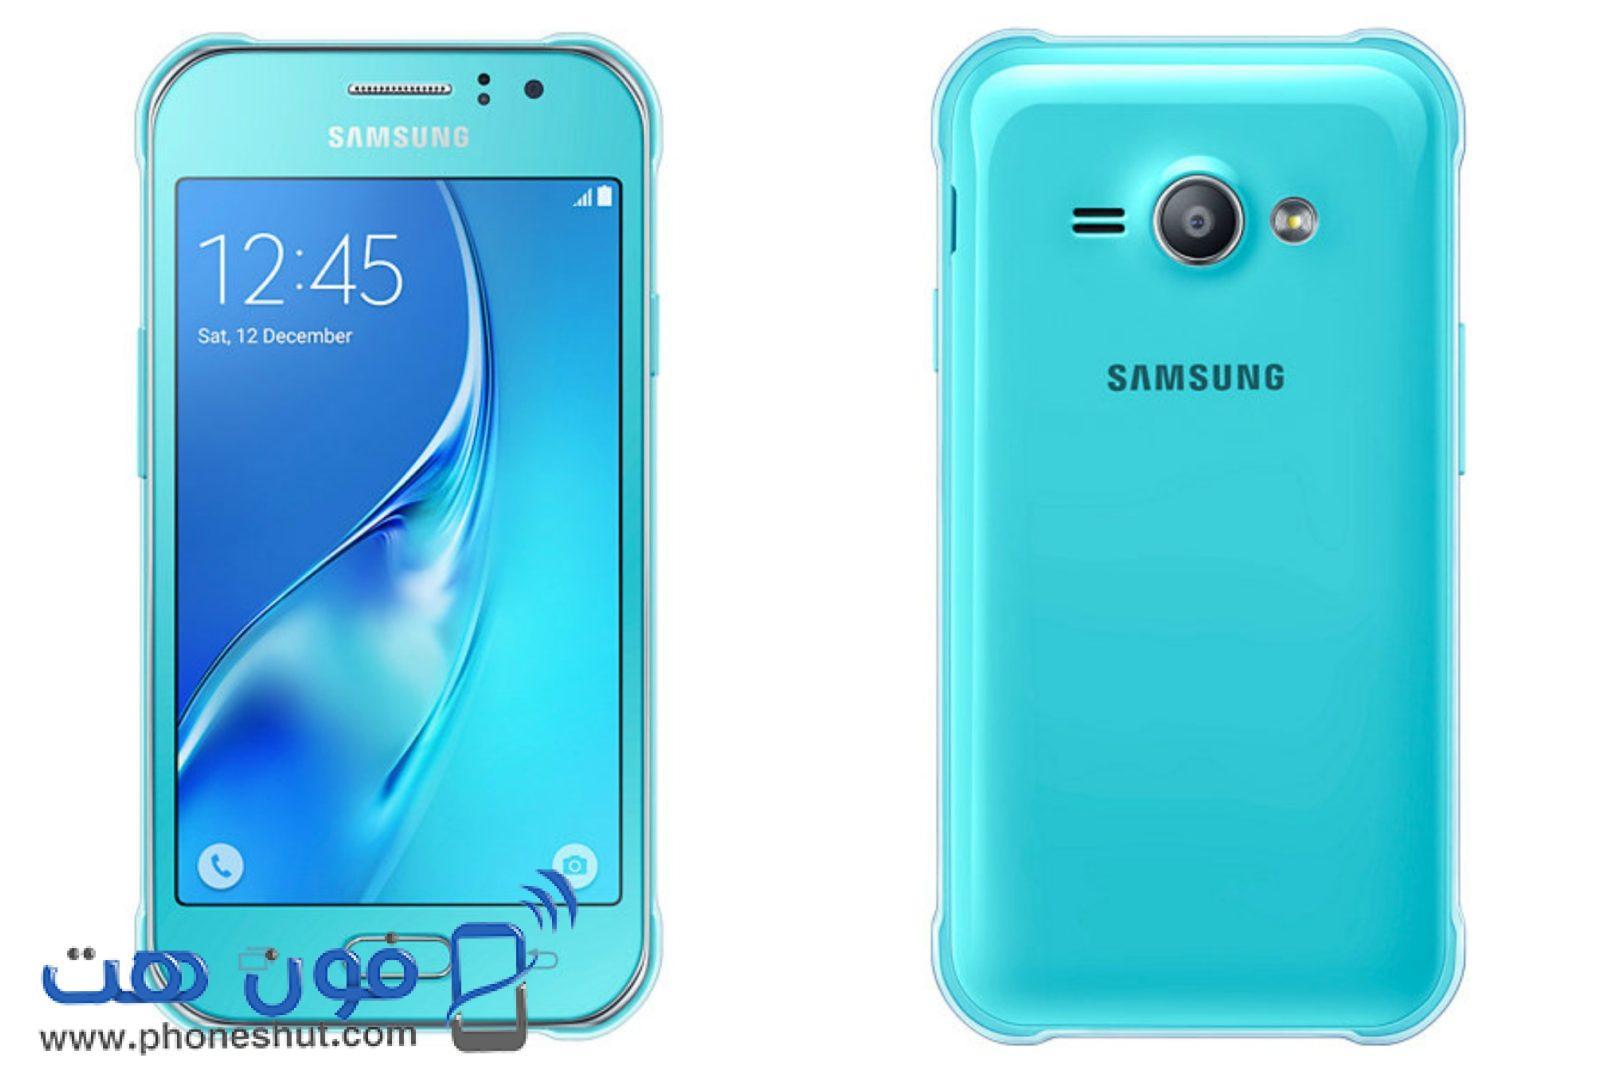 سعر ومواصفات سامسونج جالاكسي J1 أيس ـ Samsung Galaxy J1 Ace